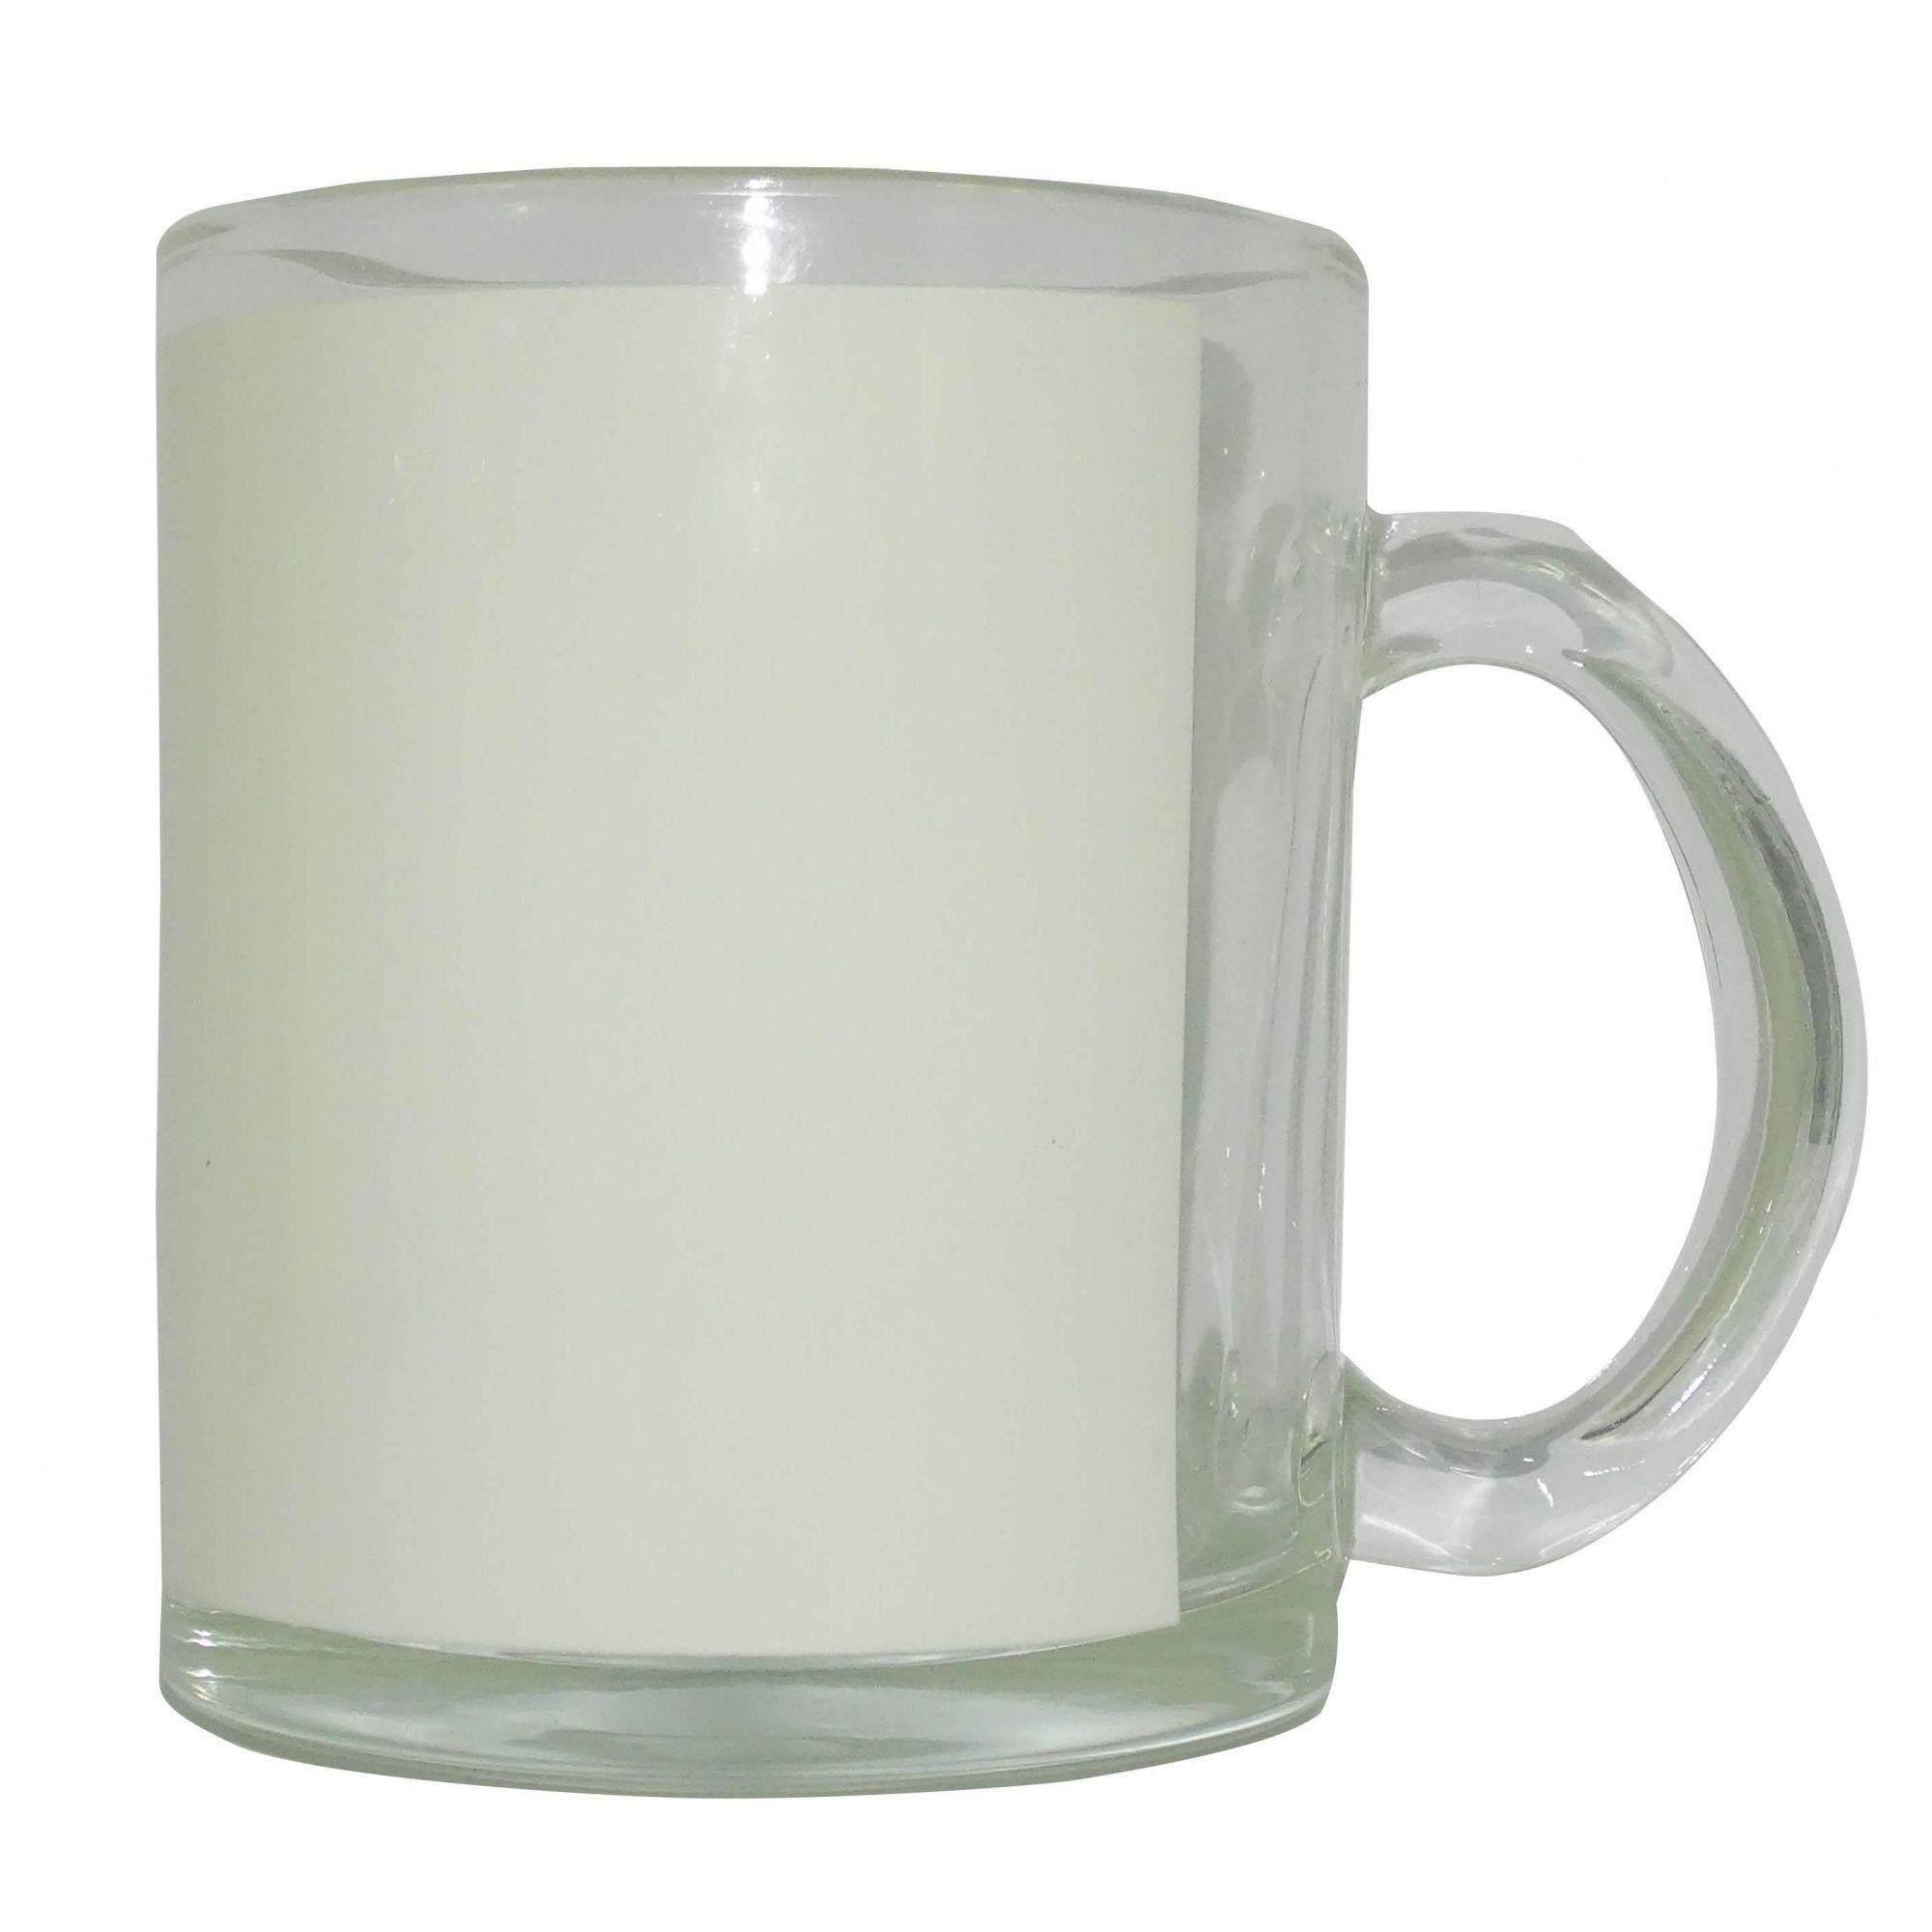 Caneca de Vidro Brilhante C/ Tarja